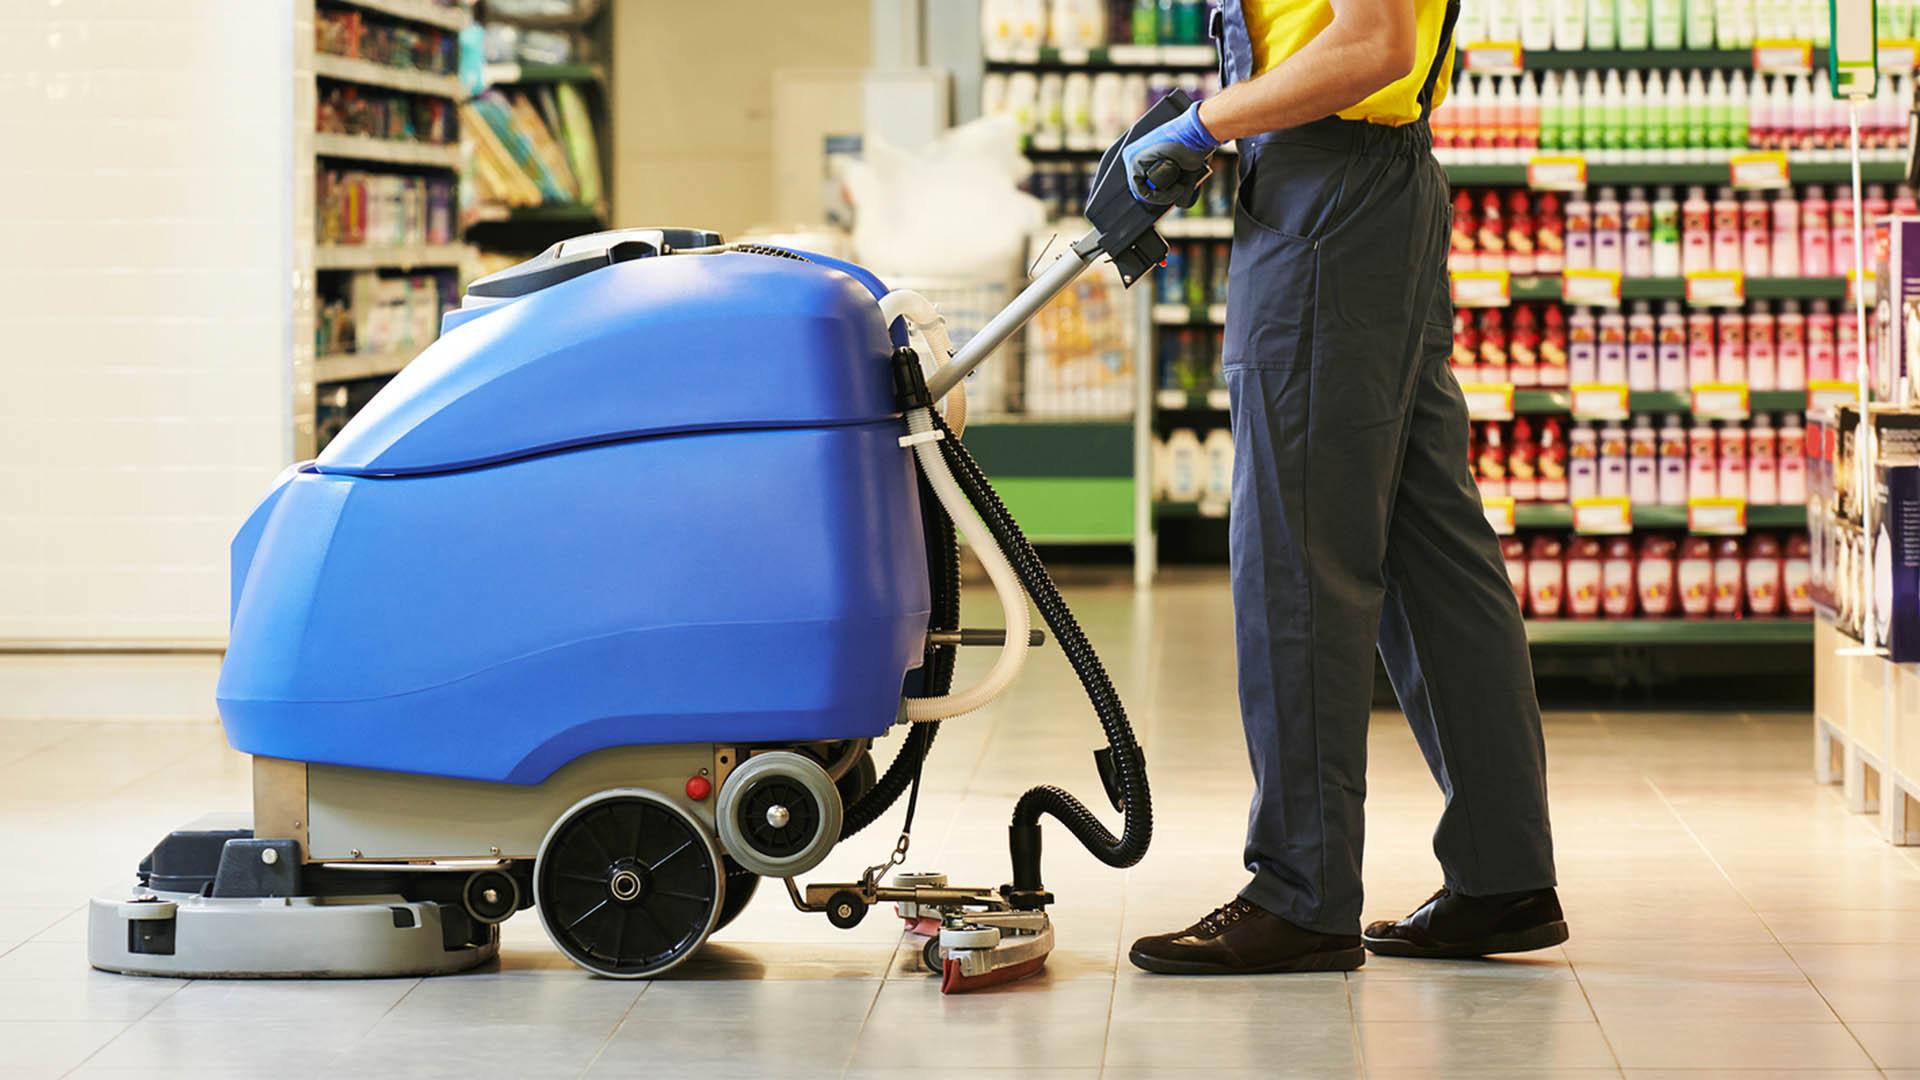 Desinfección e higienización de instalaciones Supermercados Grupo Parisien